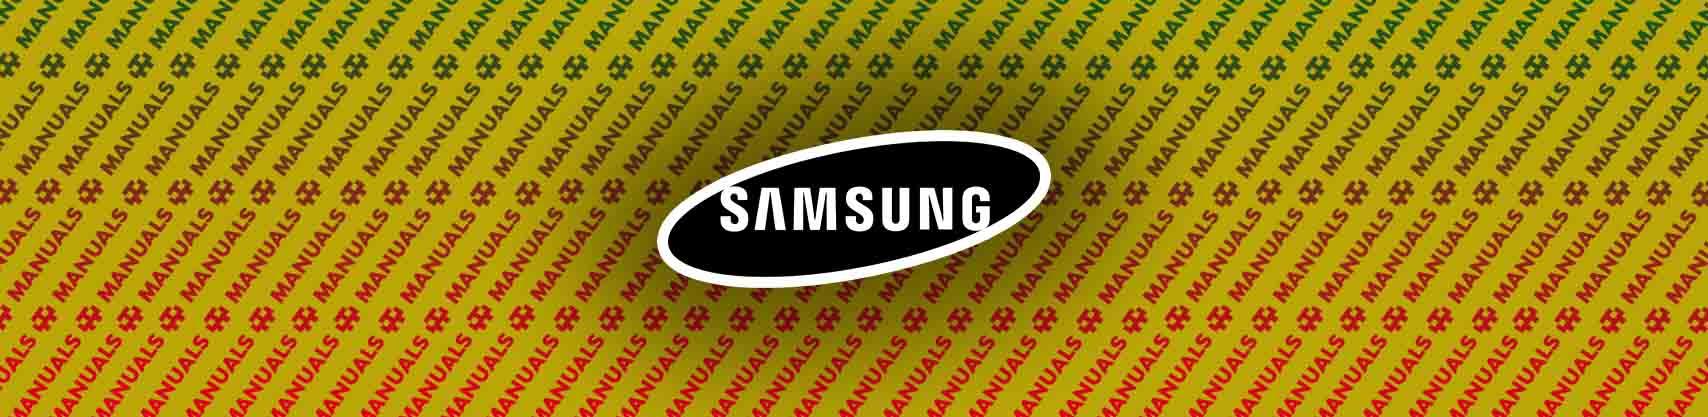 Samsung RF260BEAESR Manual